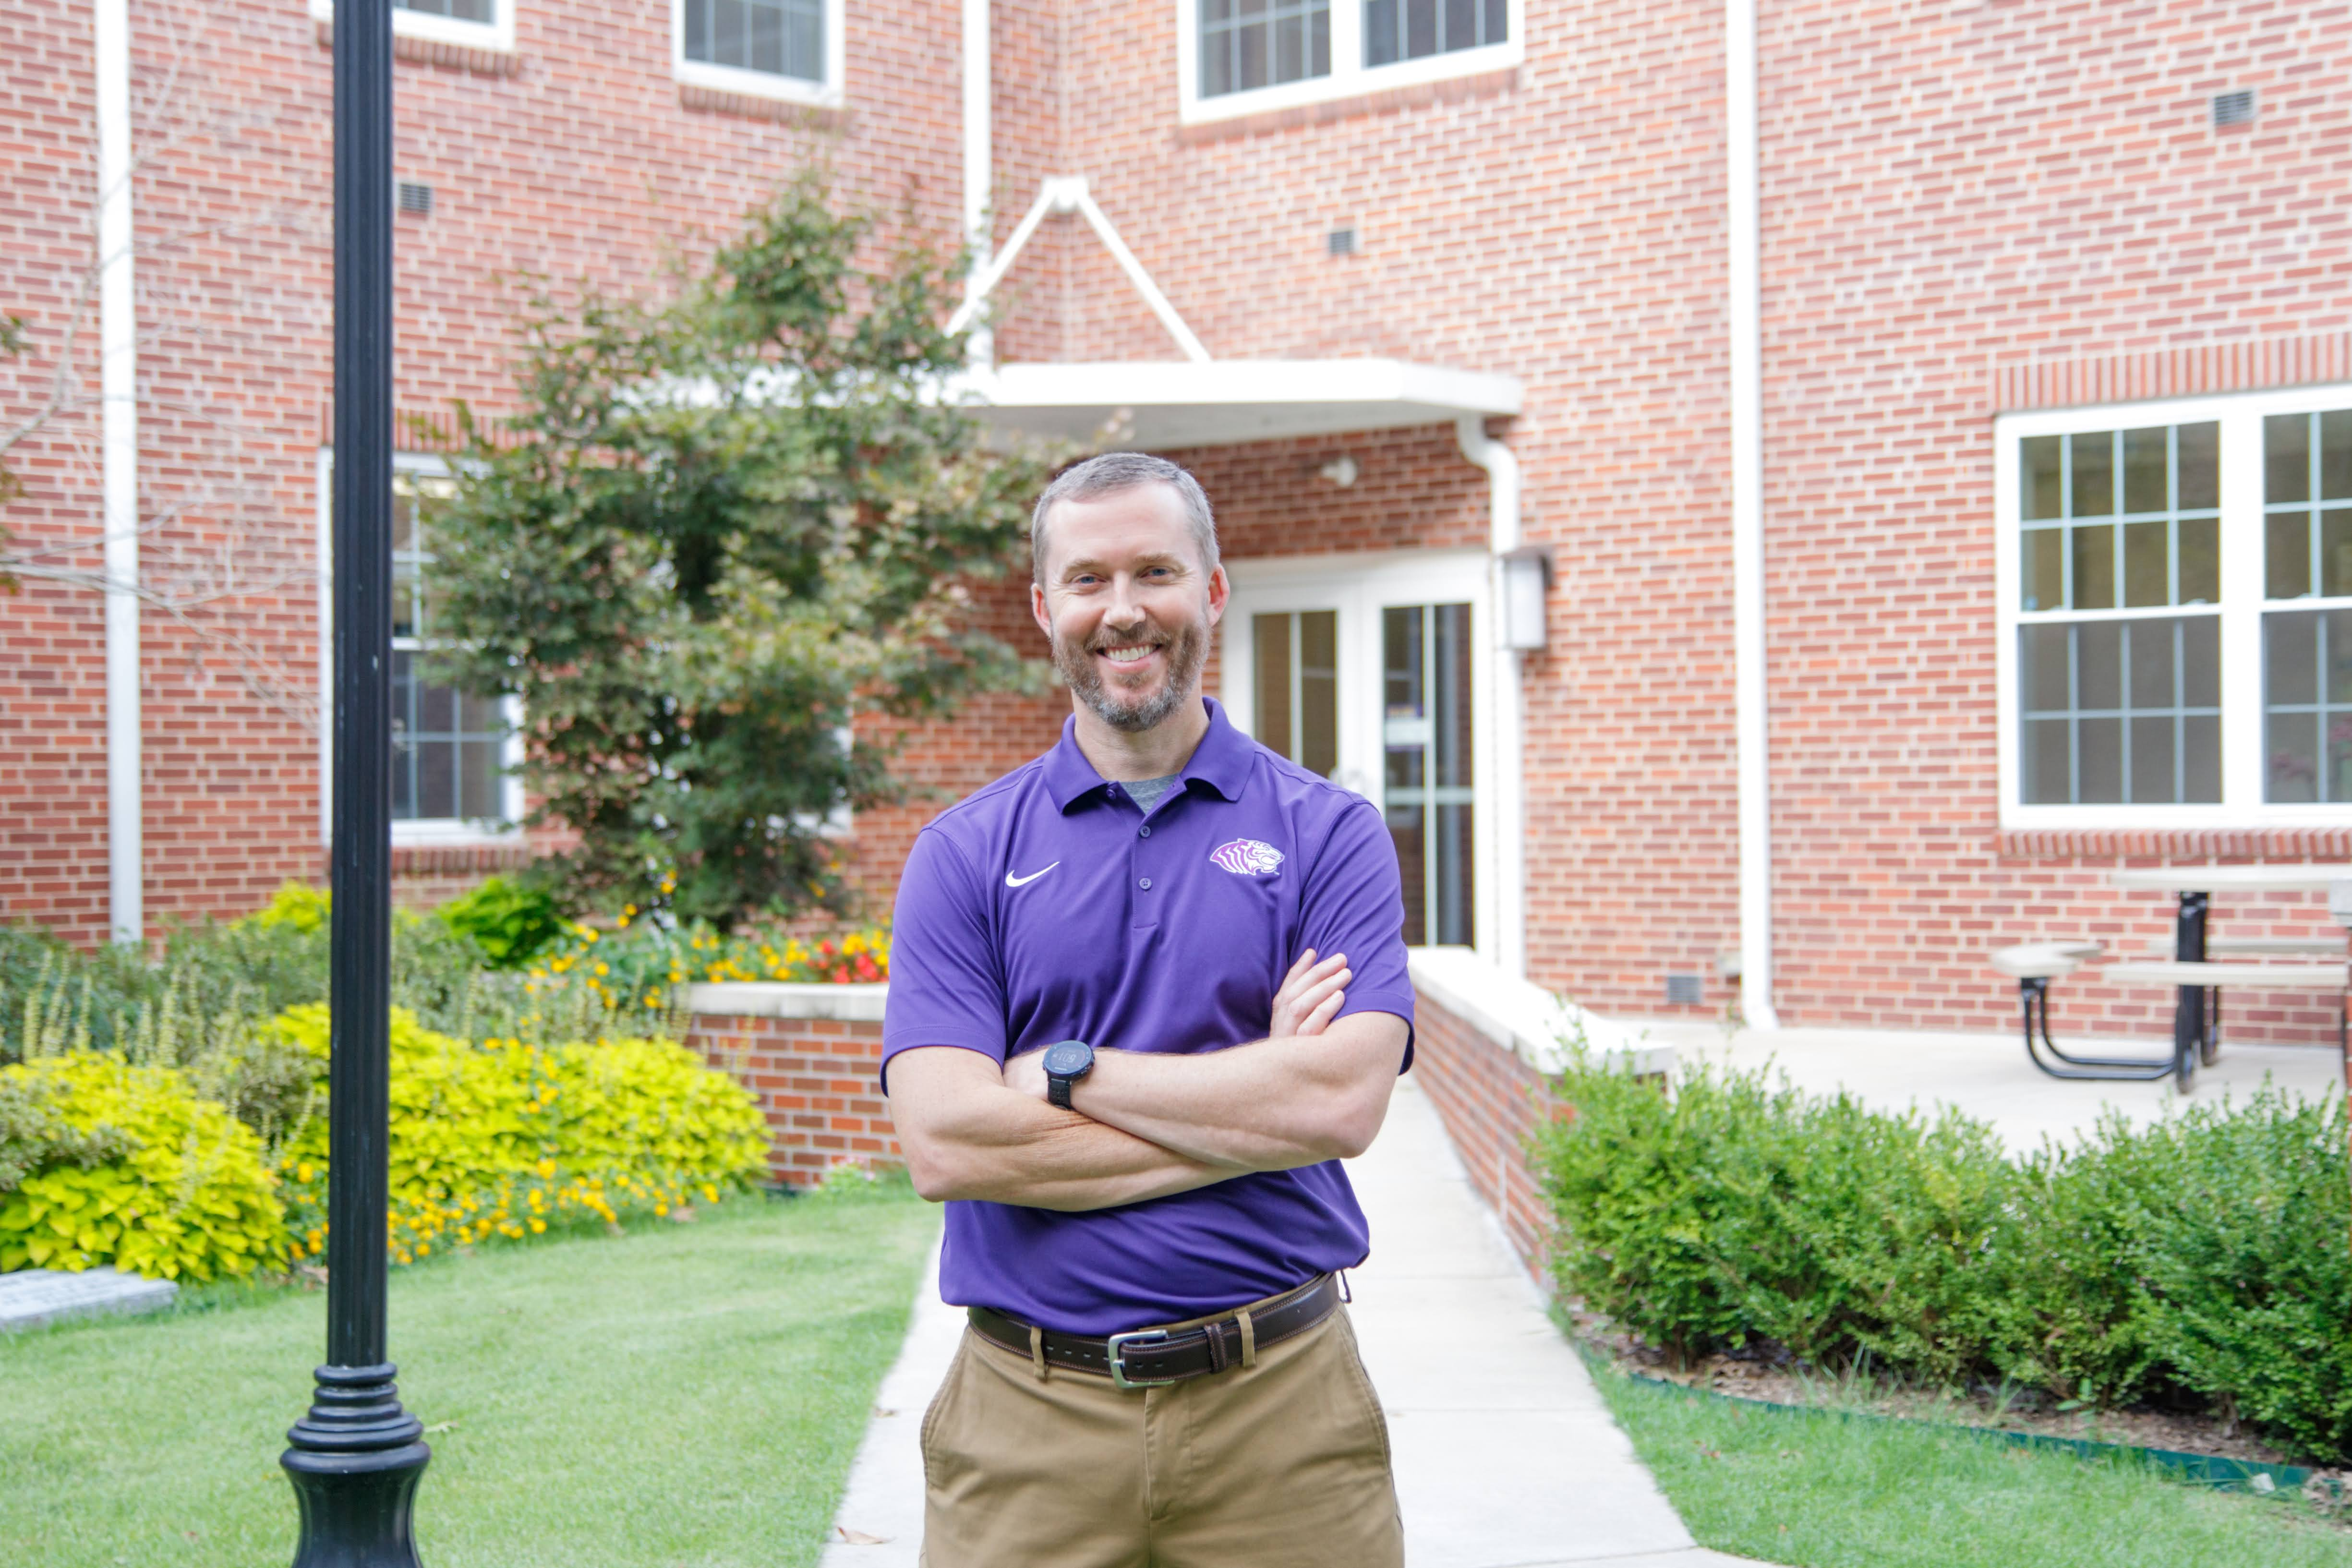 Greer, Motl start new roles as deans of schools